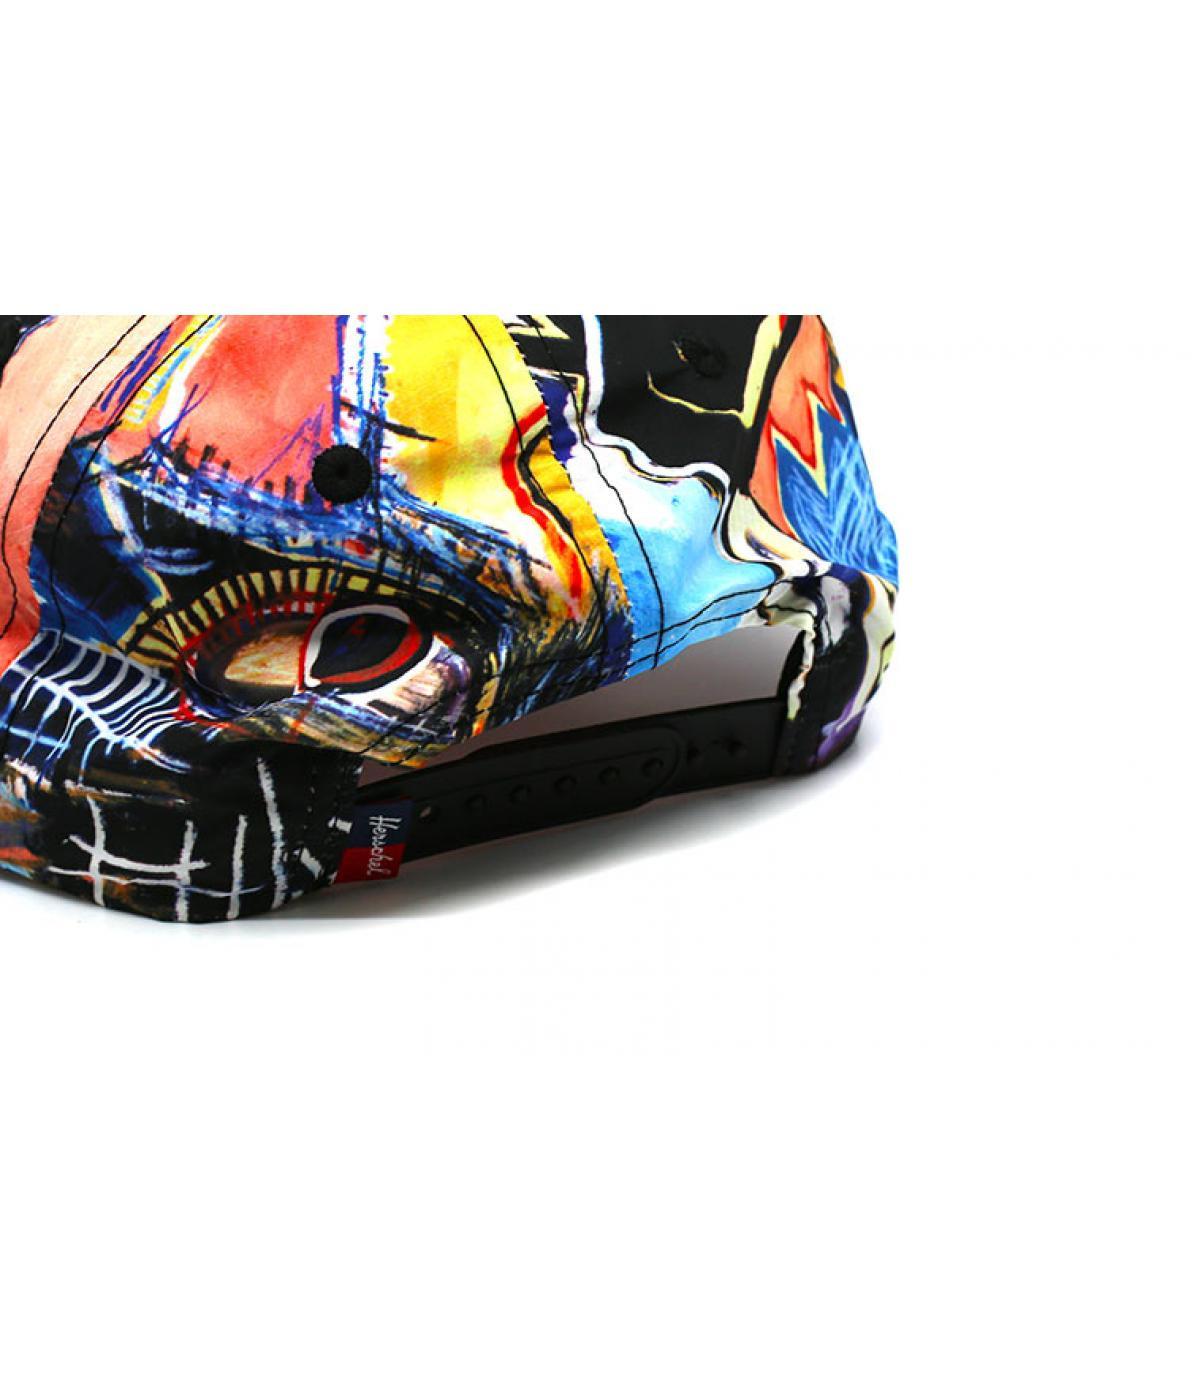 Detalles Curve Basquiat Mosby Voyage imagen 5